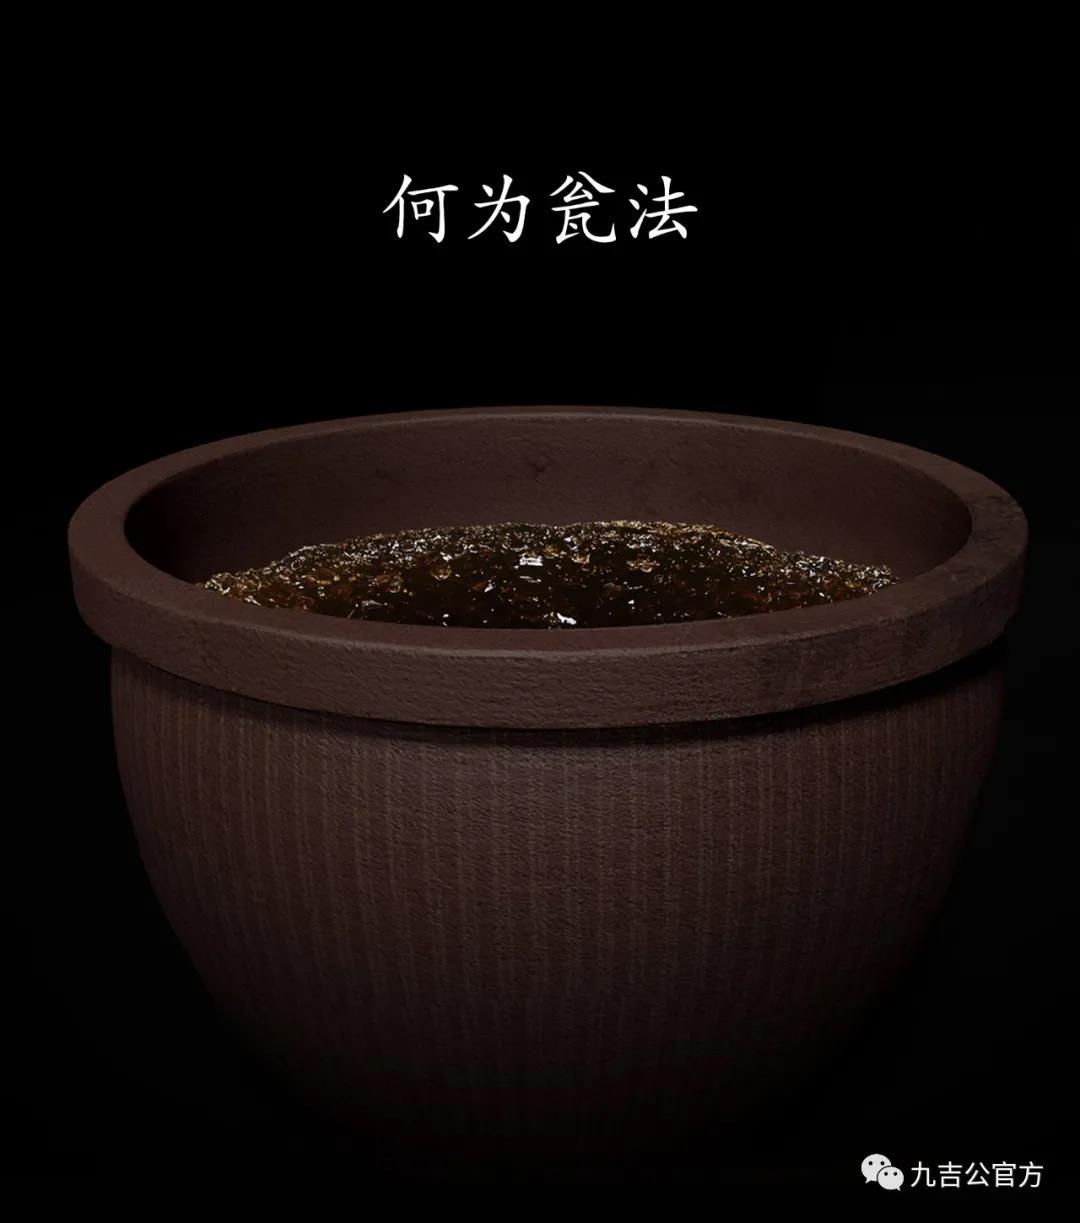 WeChat Image 20210708202330